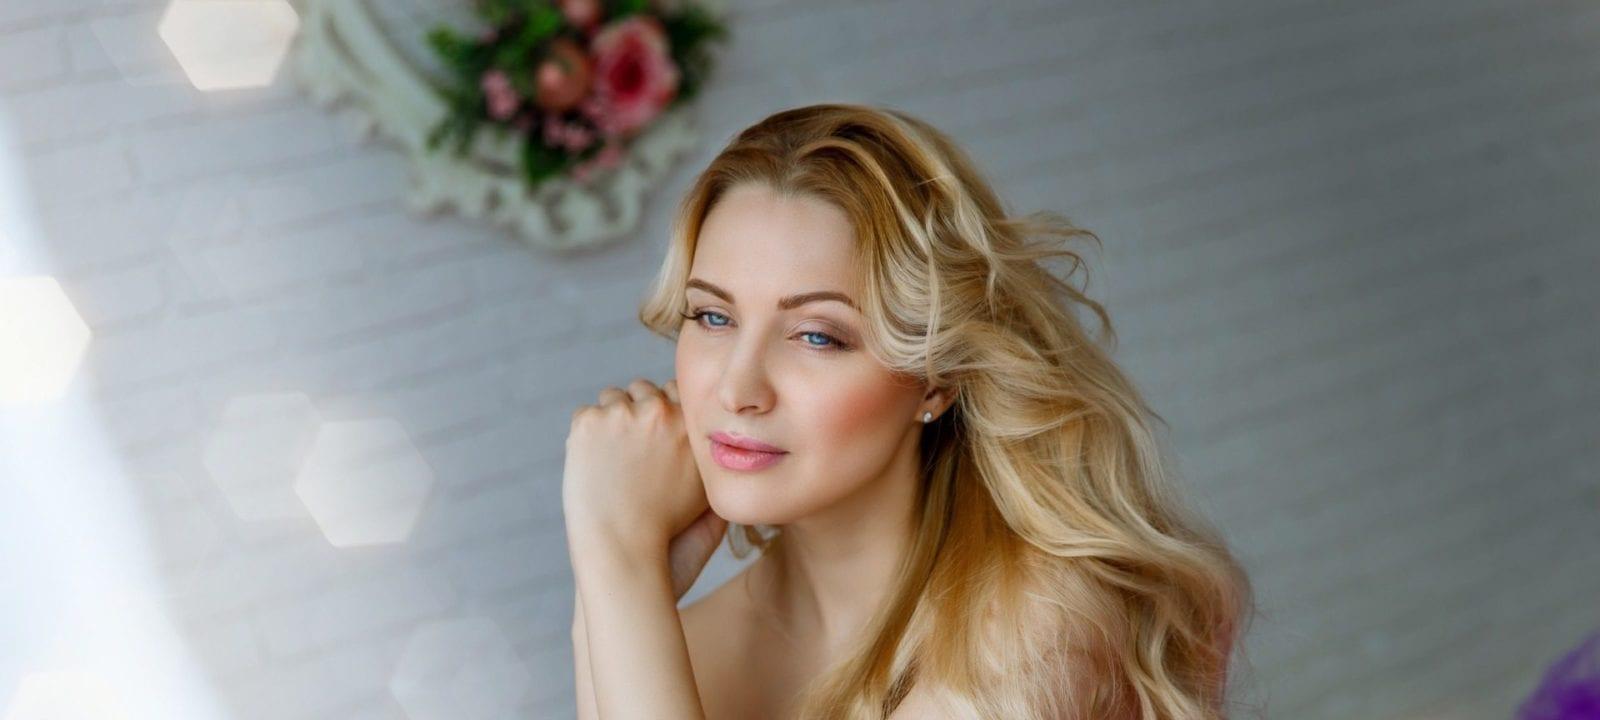 Gesichtsbehandlung - Kosmetik Artemania Fehraltorf - Nail Art - Beauty und Care